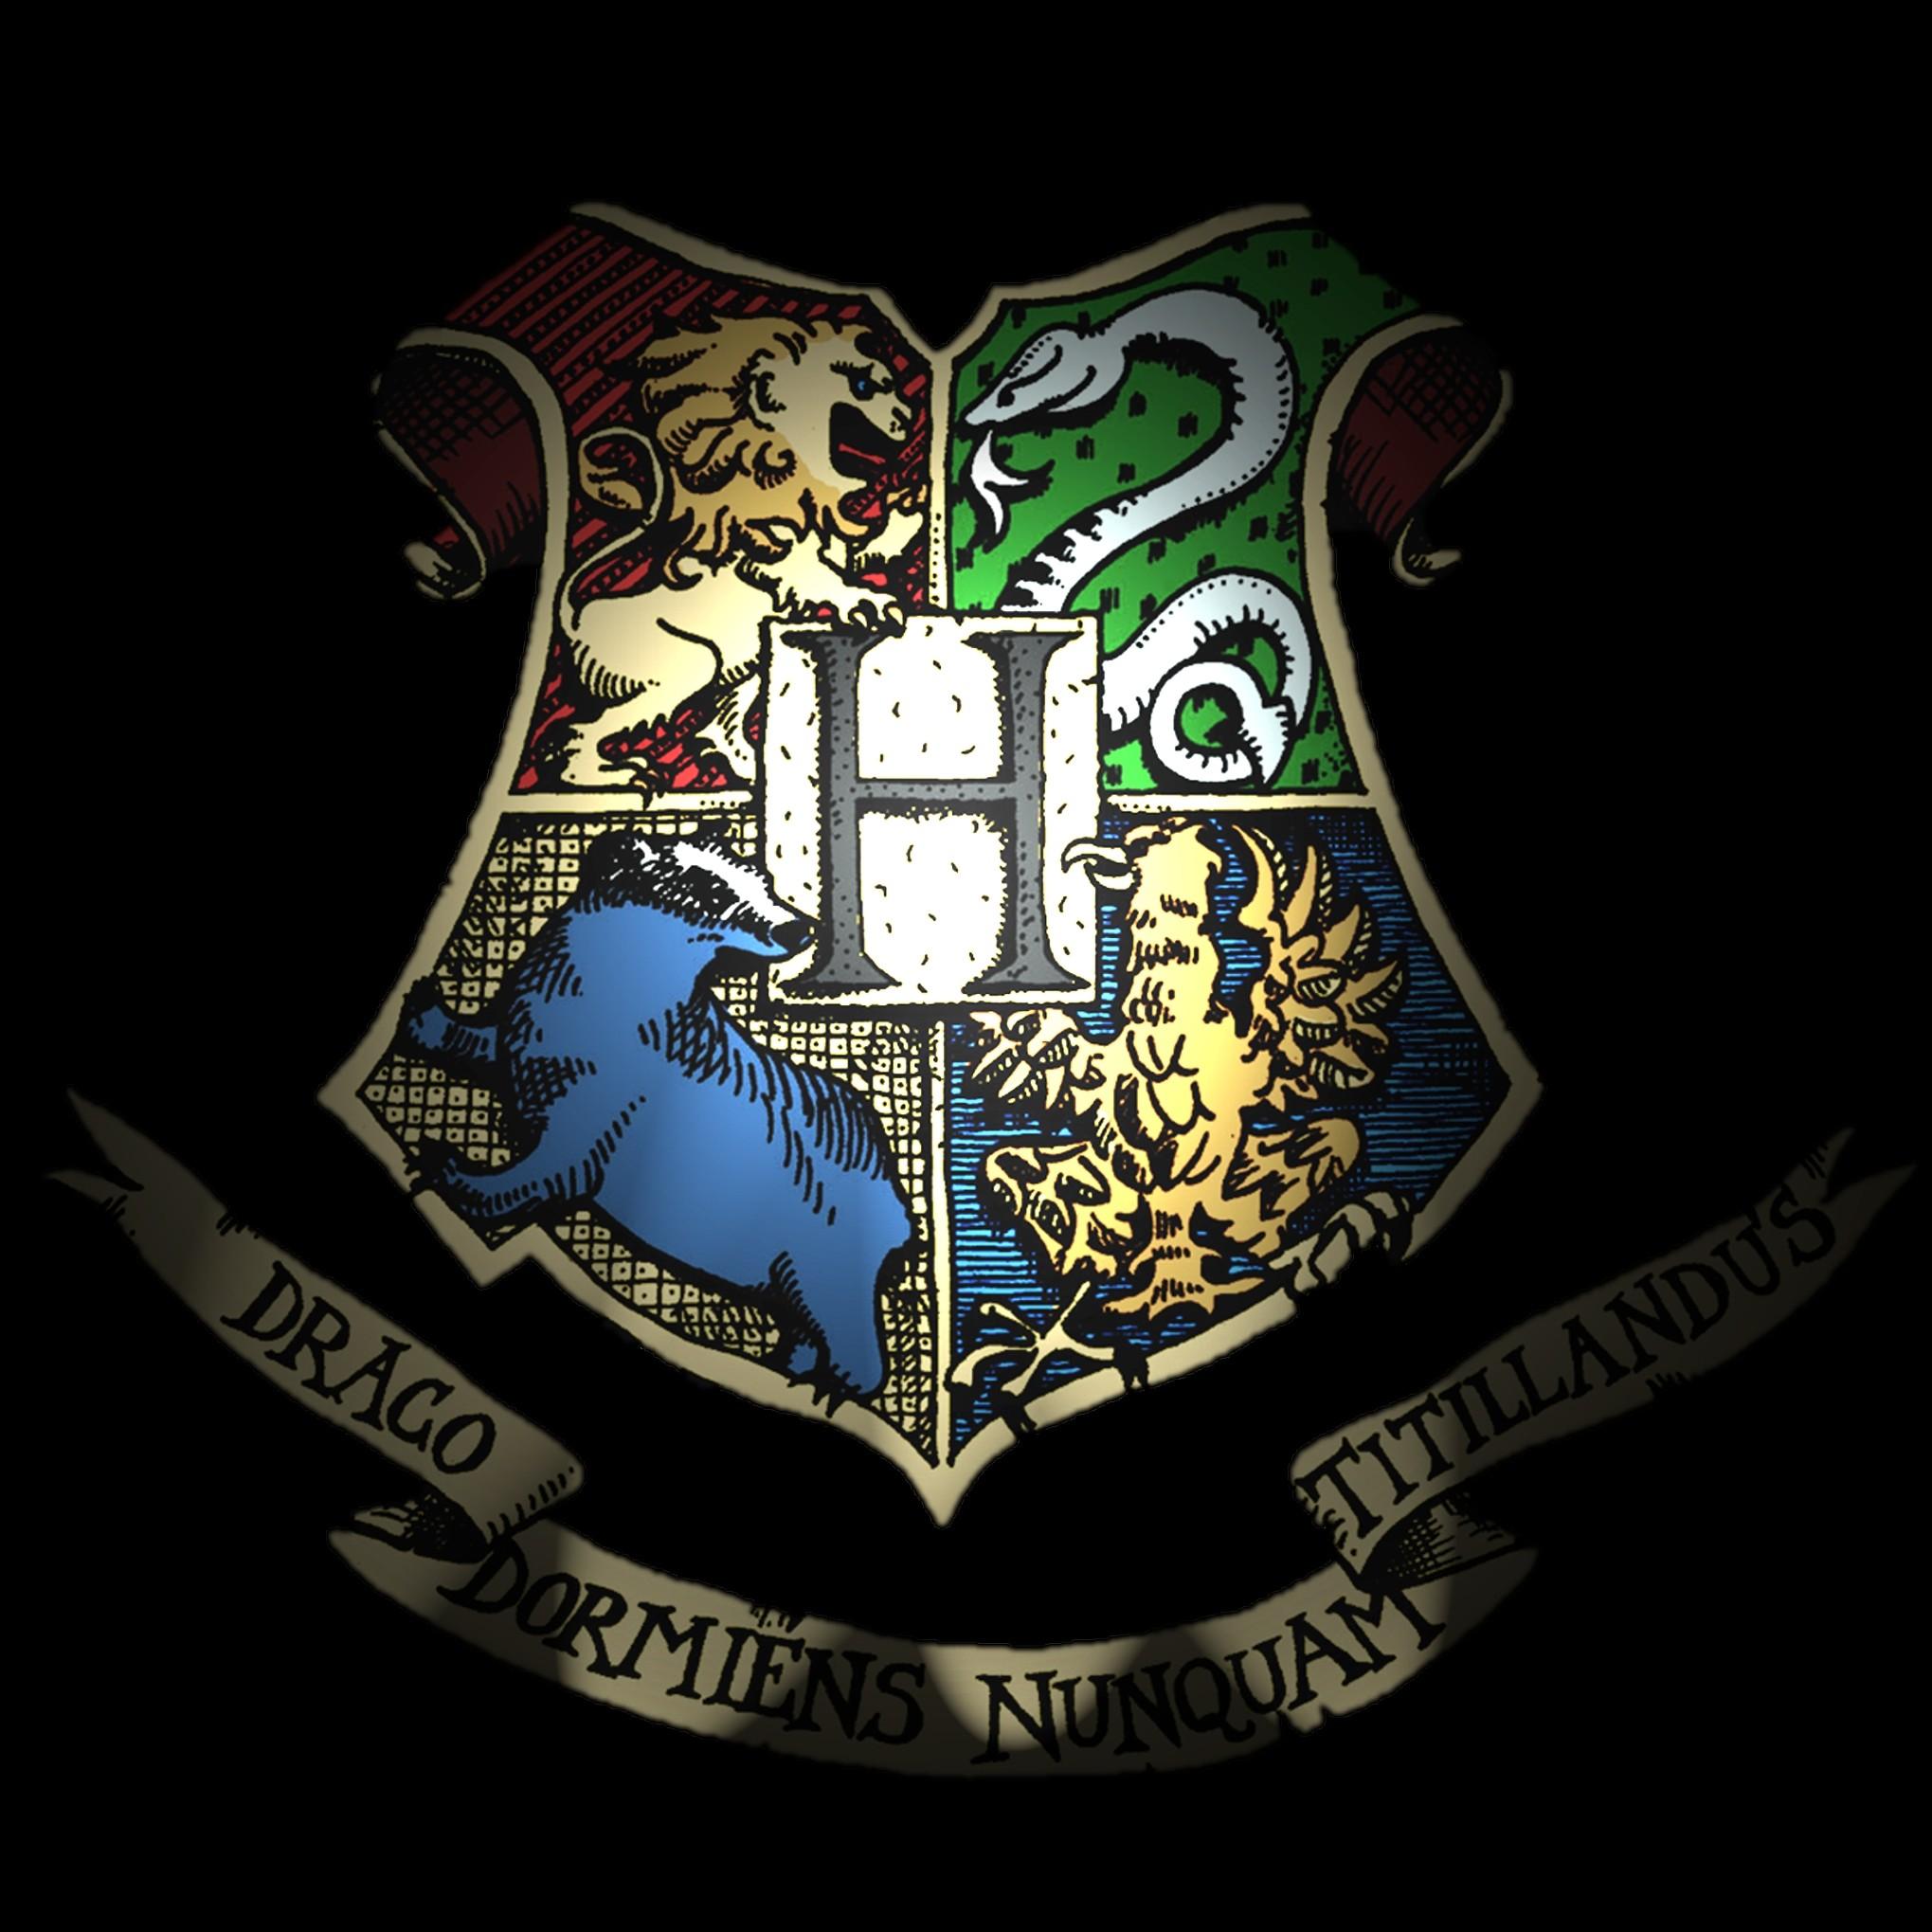 Harry Potter Hogwarts Crest Wallpaper Harry potter fans can now